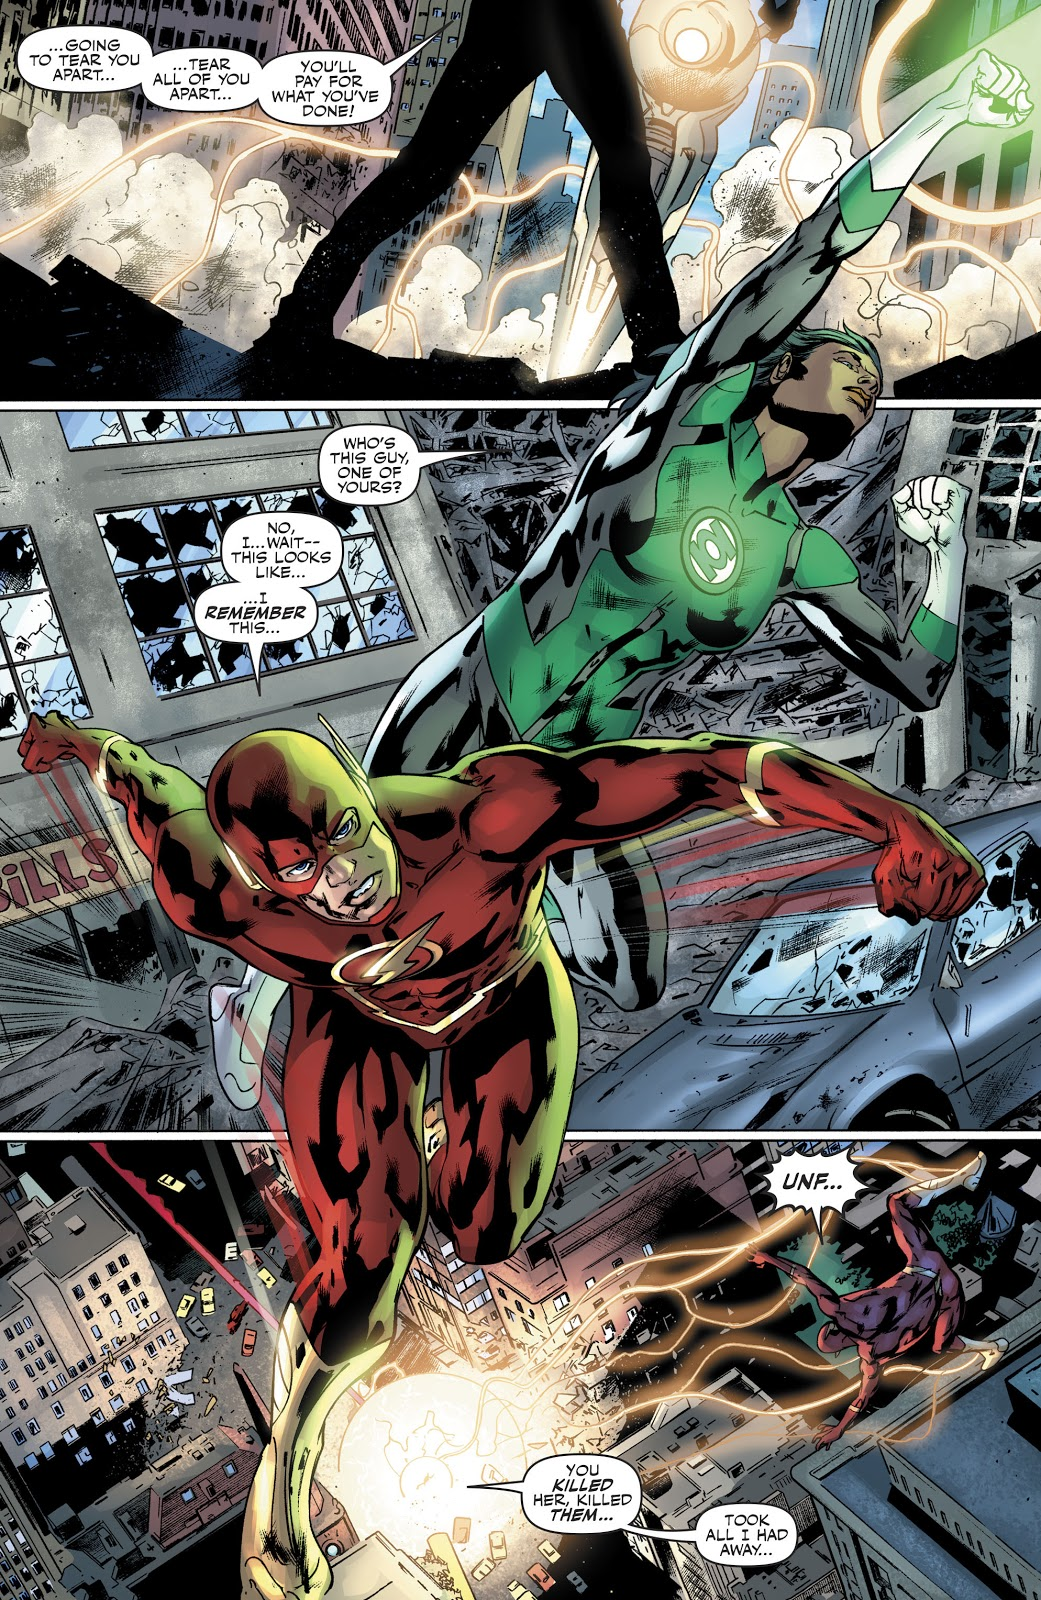 Justice League Endless review